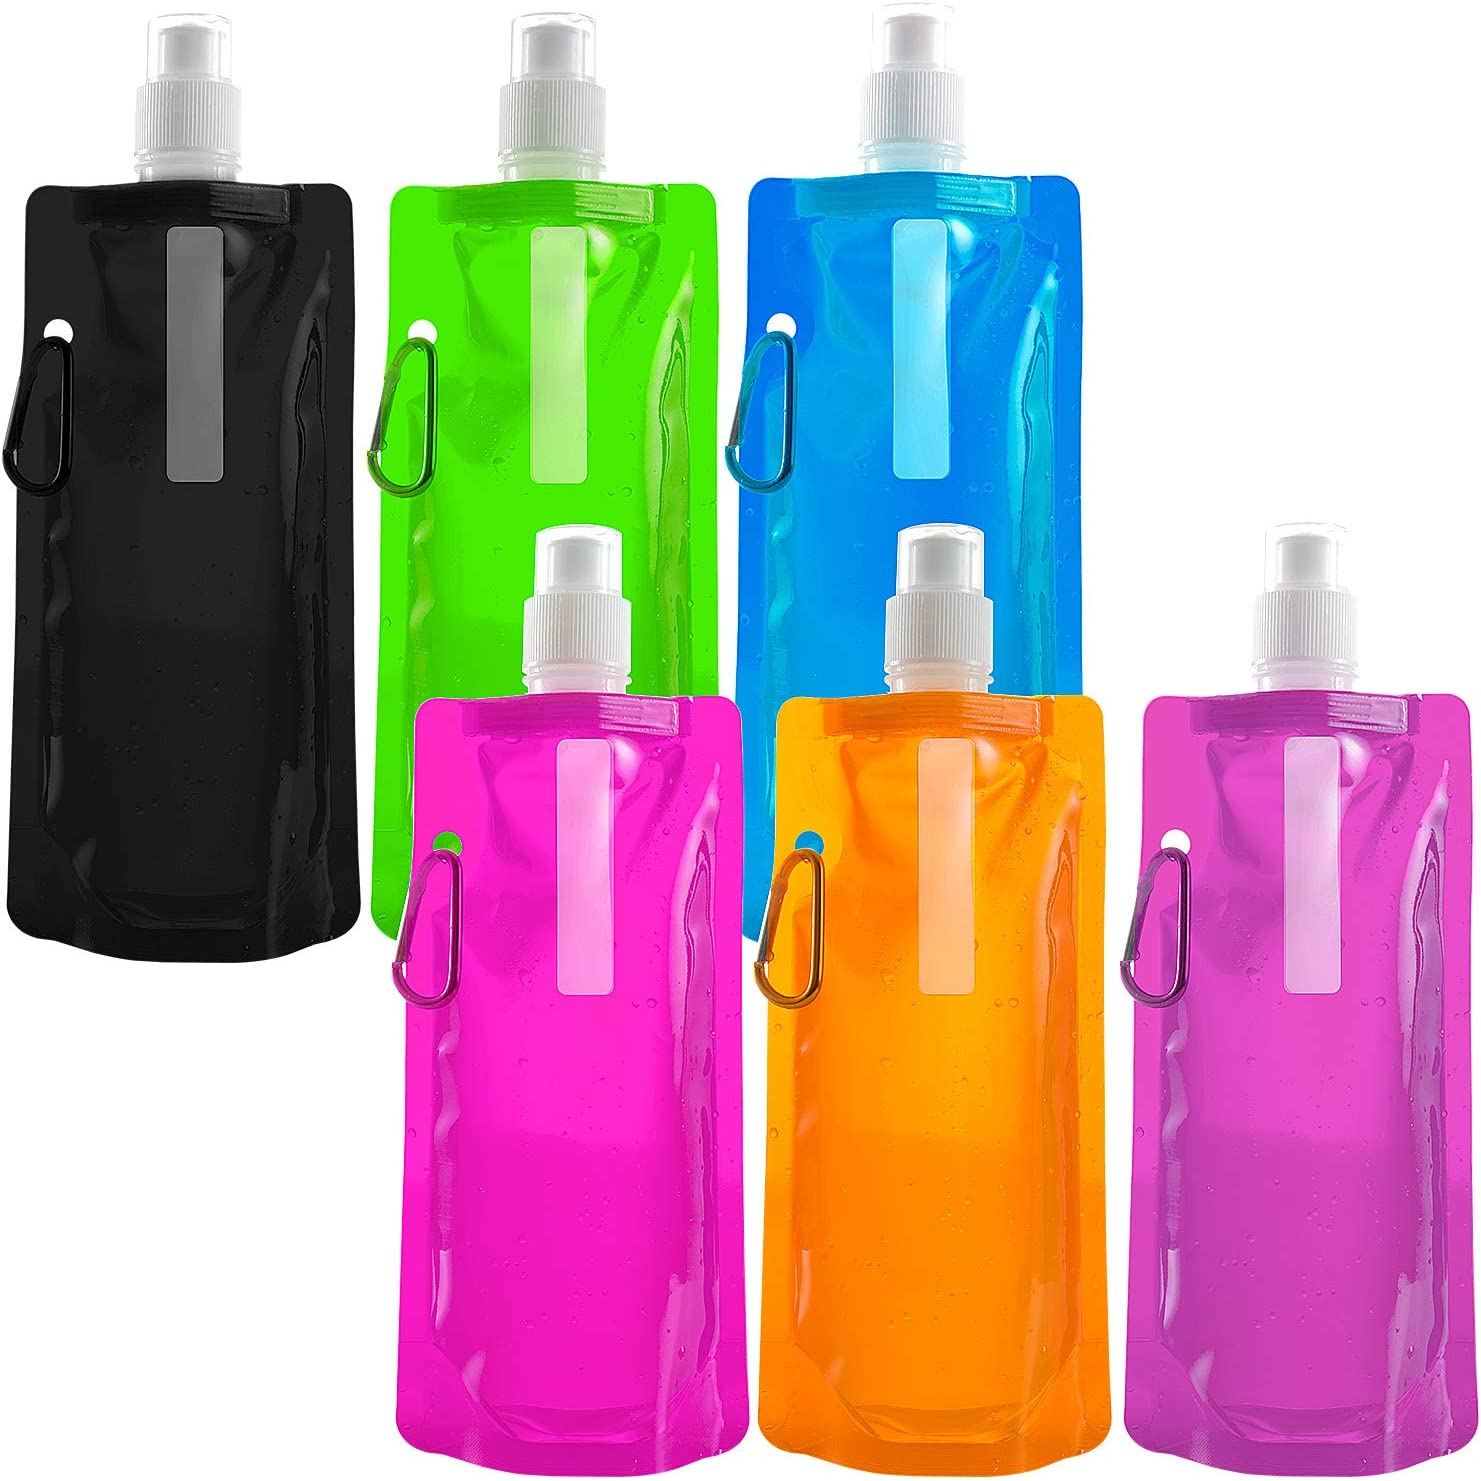 Jolintek Botella De Agua Plegable Reutilizable Bolsa de Bebida de Agua con Clip para Actividades,Senderismo, Aventuras, Viajes,Mochilero(6 Colores)